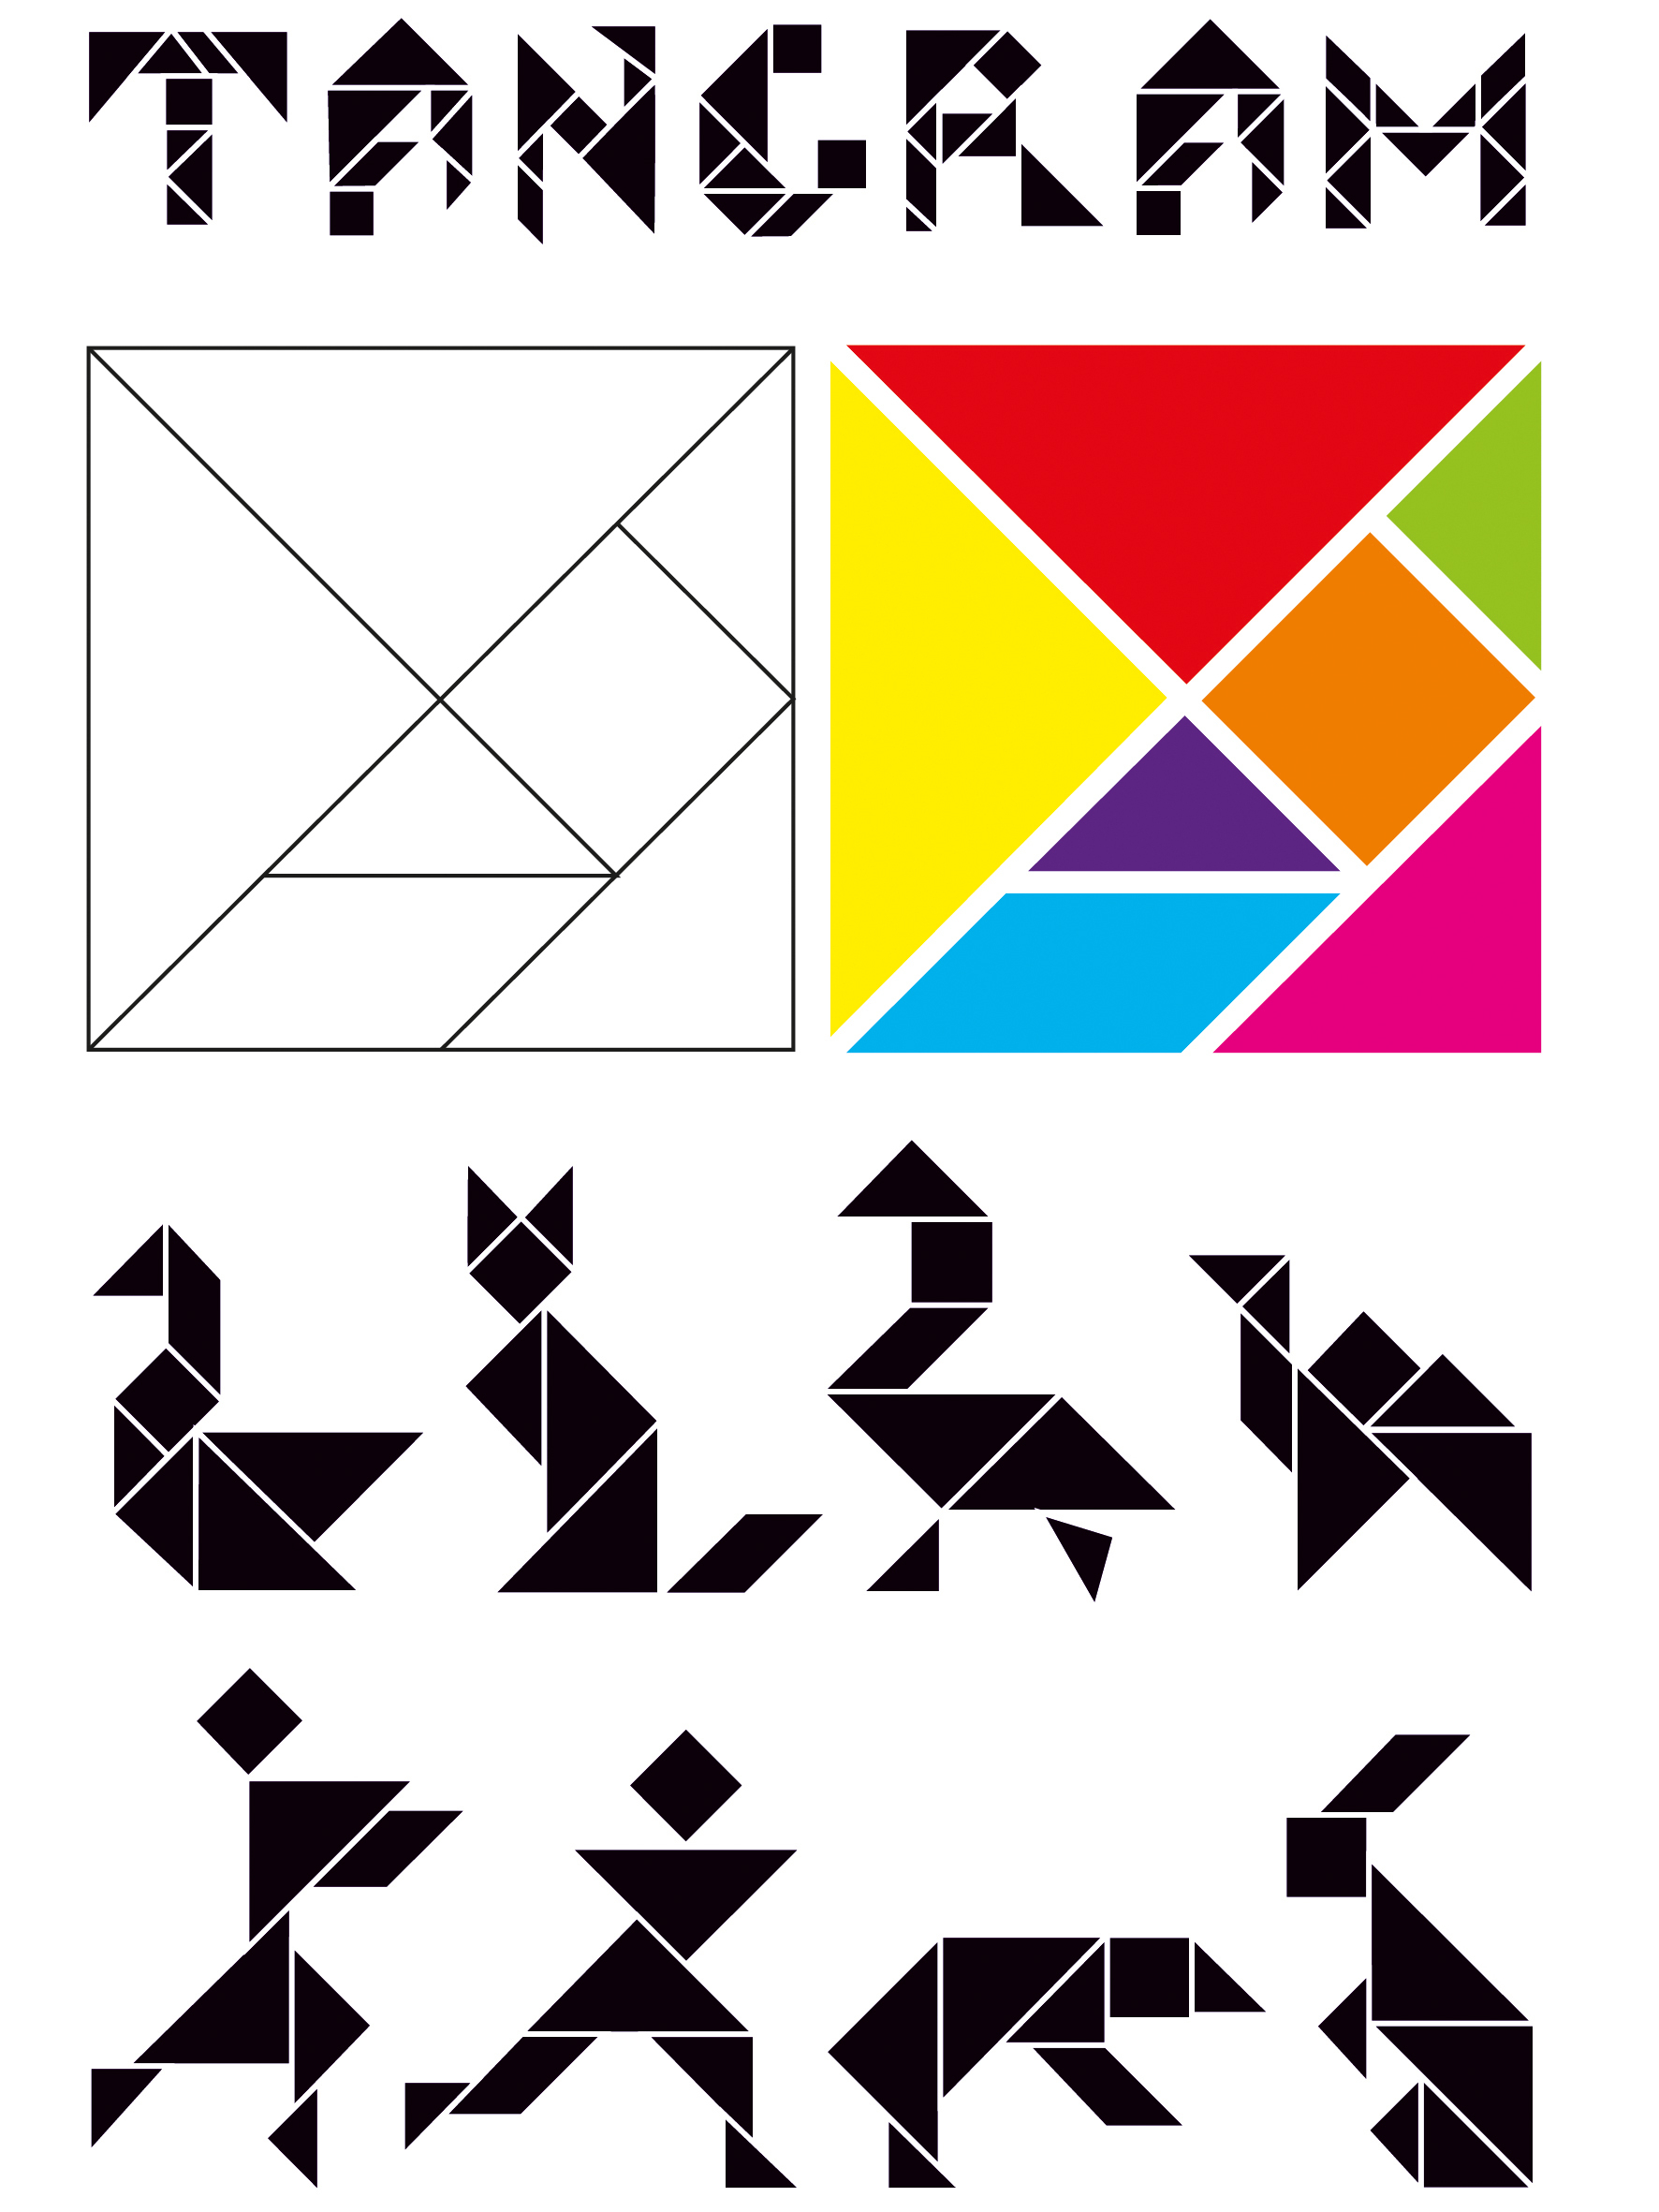 Modèles Tangram | encequiconcerne Tangram A Imprimer